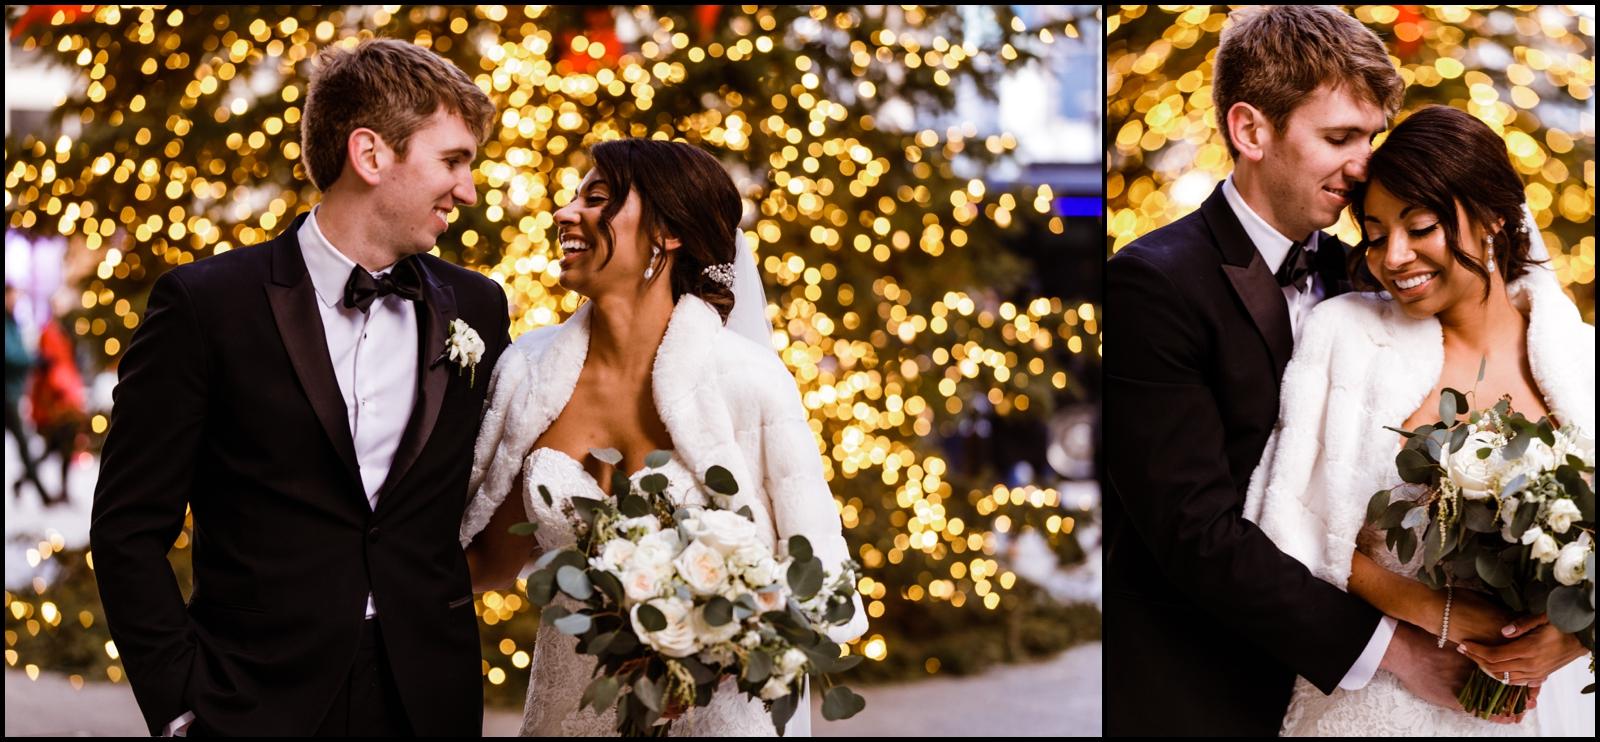 Chicago Wedding- Alice Millar Chapel Ceremony, London House Reception_0096.jpg